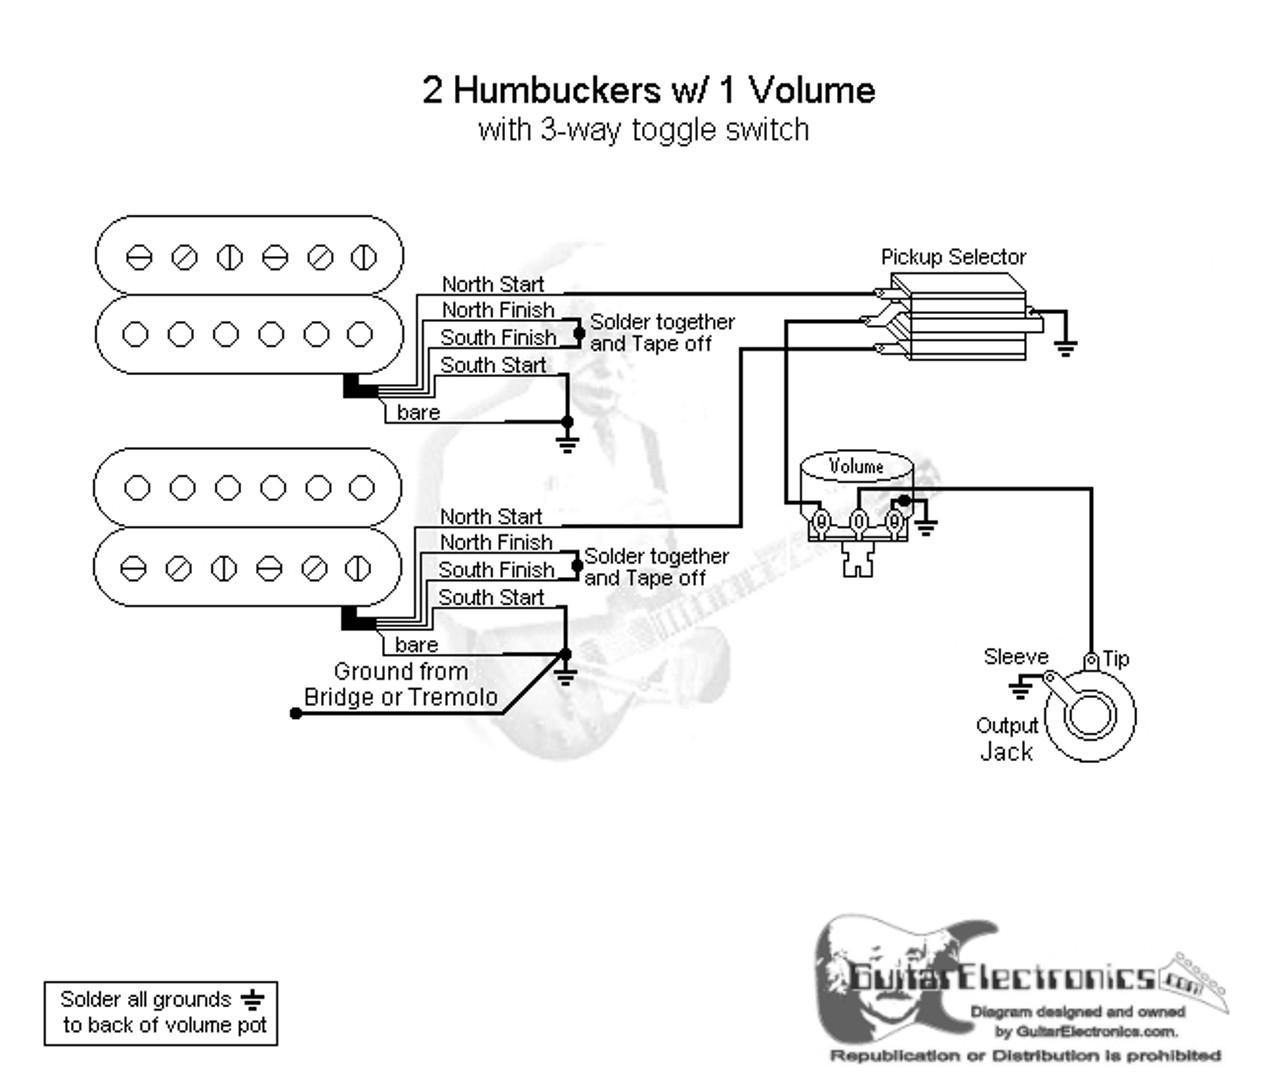 wiring diagram free download 2 humbucker 5 way switch wiring 1 way switch wiring diagram free [ 1280 x 1083 Pixel ]